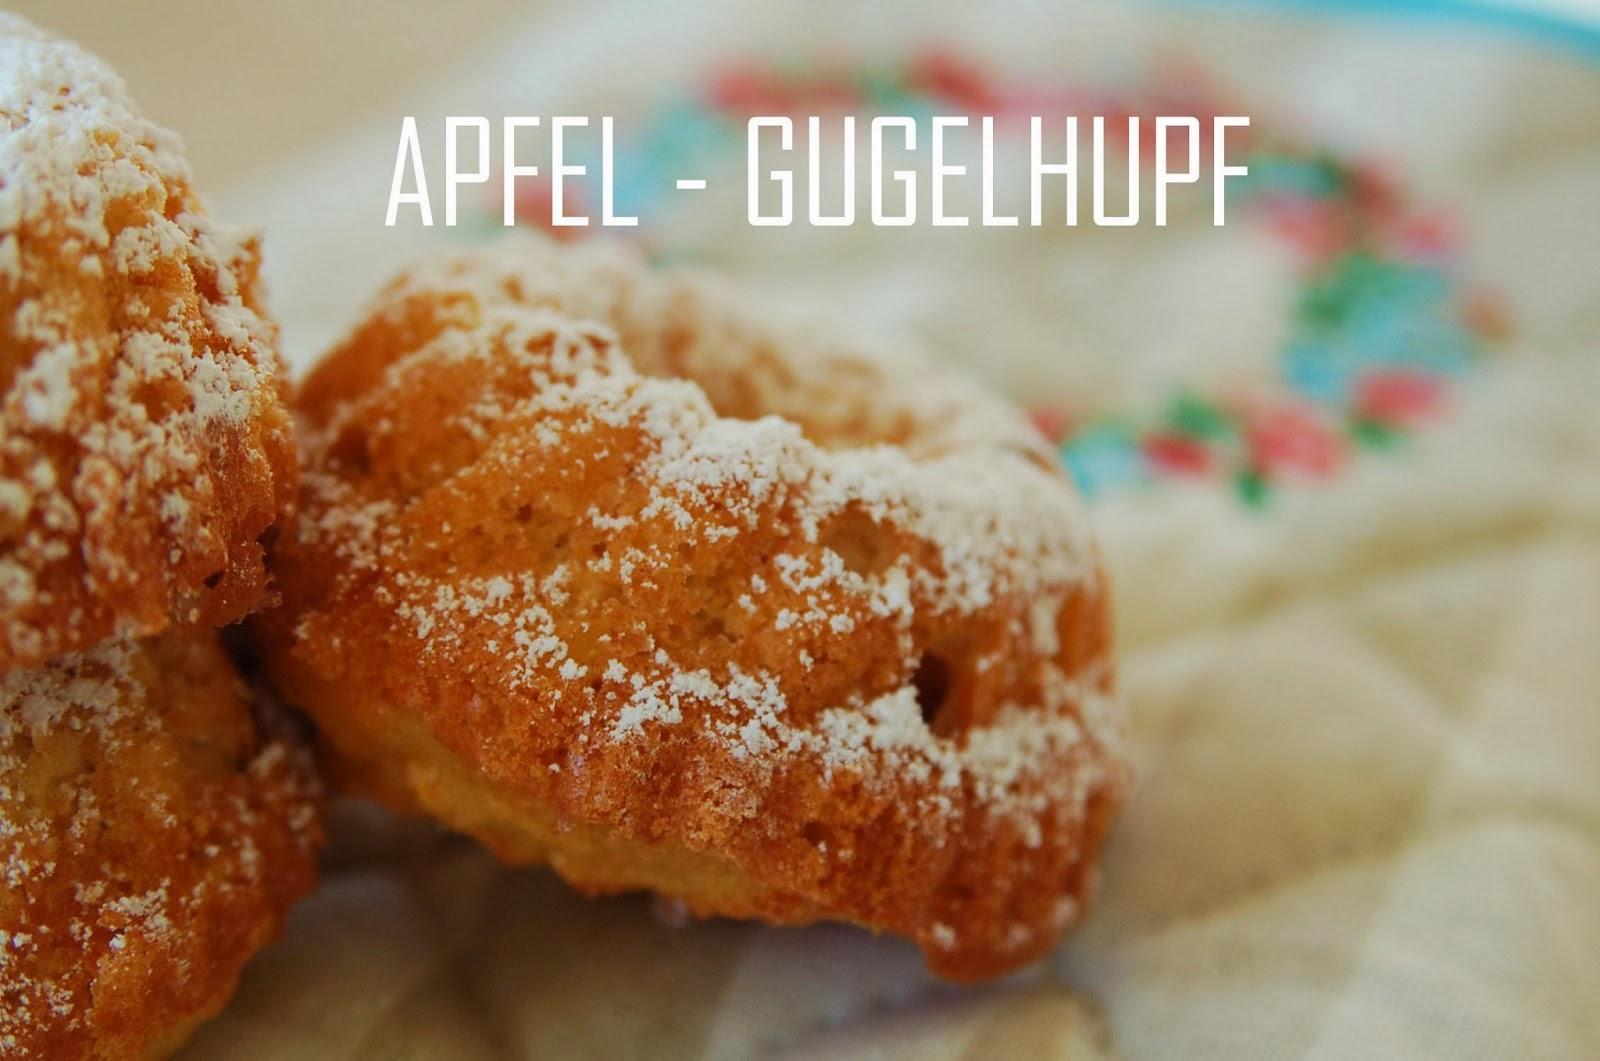 http://pia-malagala.blogspot.de/2015/03/apfel-gugelhupf.html